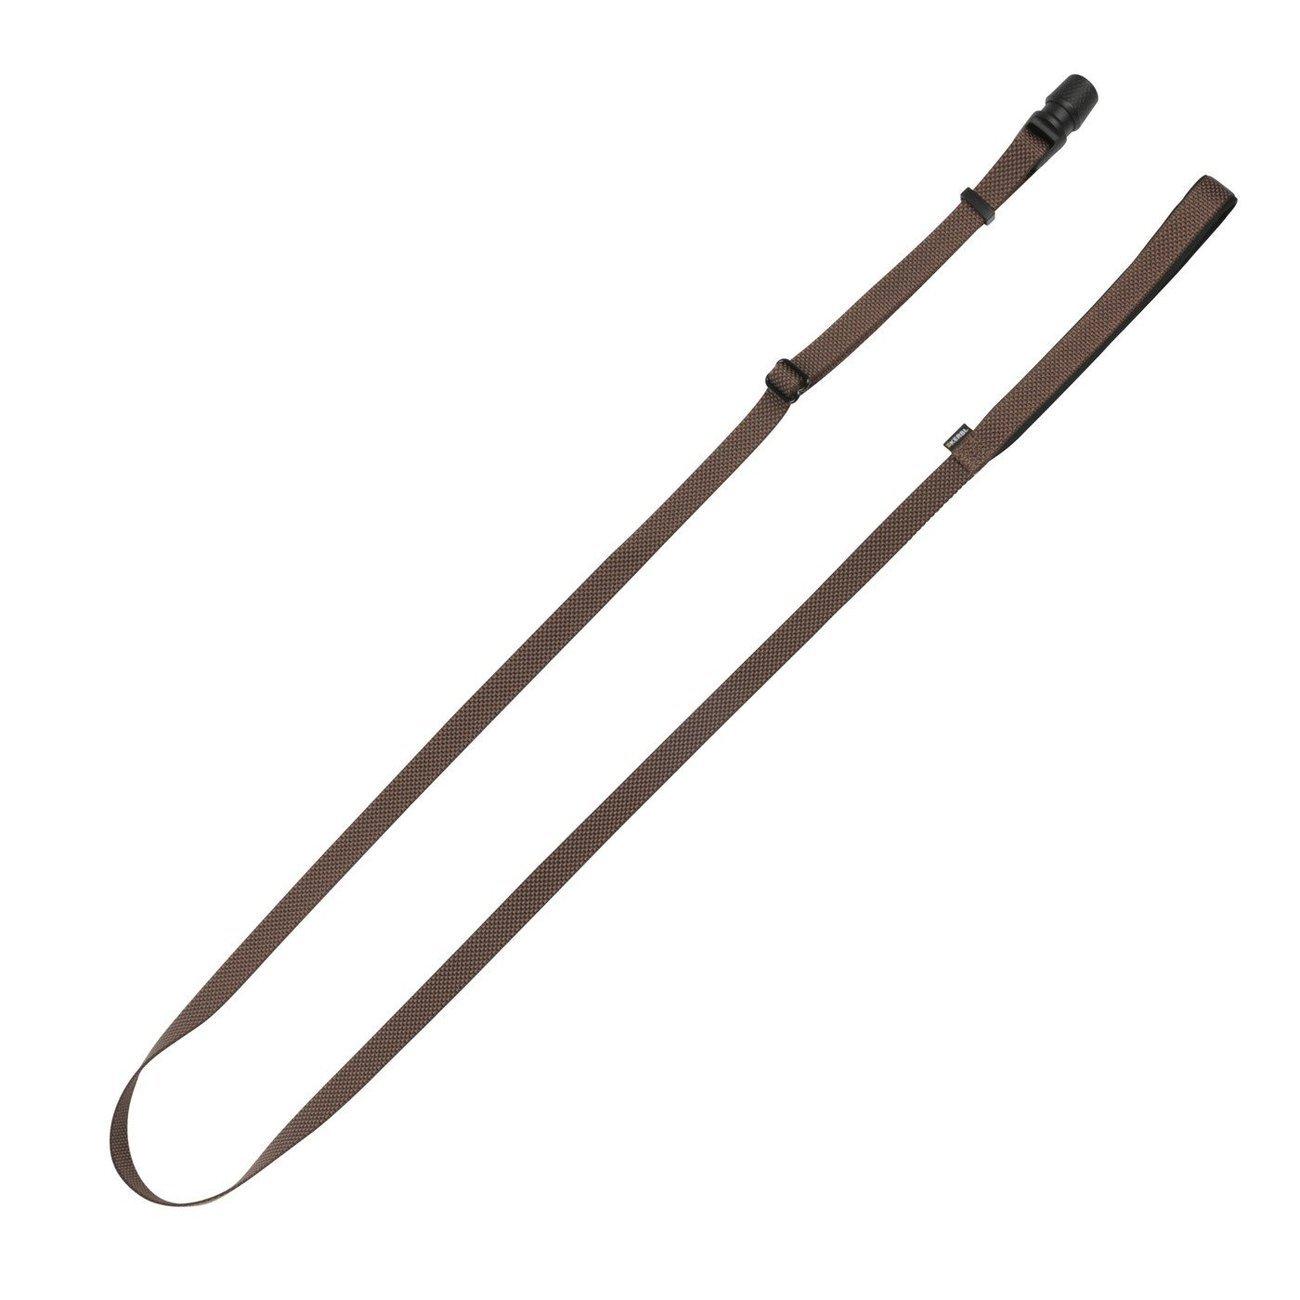 Hundeleine Flat GoLeyGo 2.0, braun, 20mm x 140-200cm